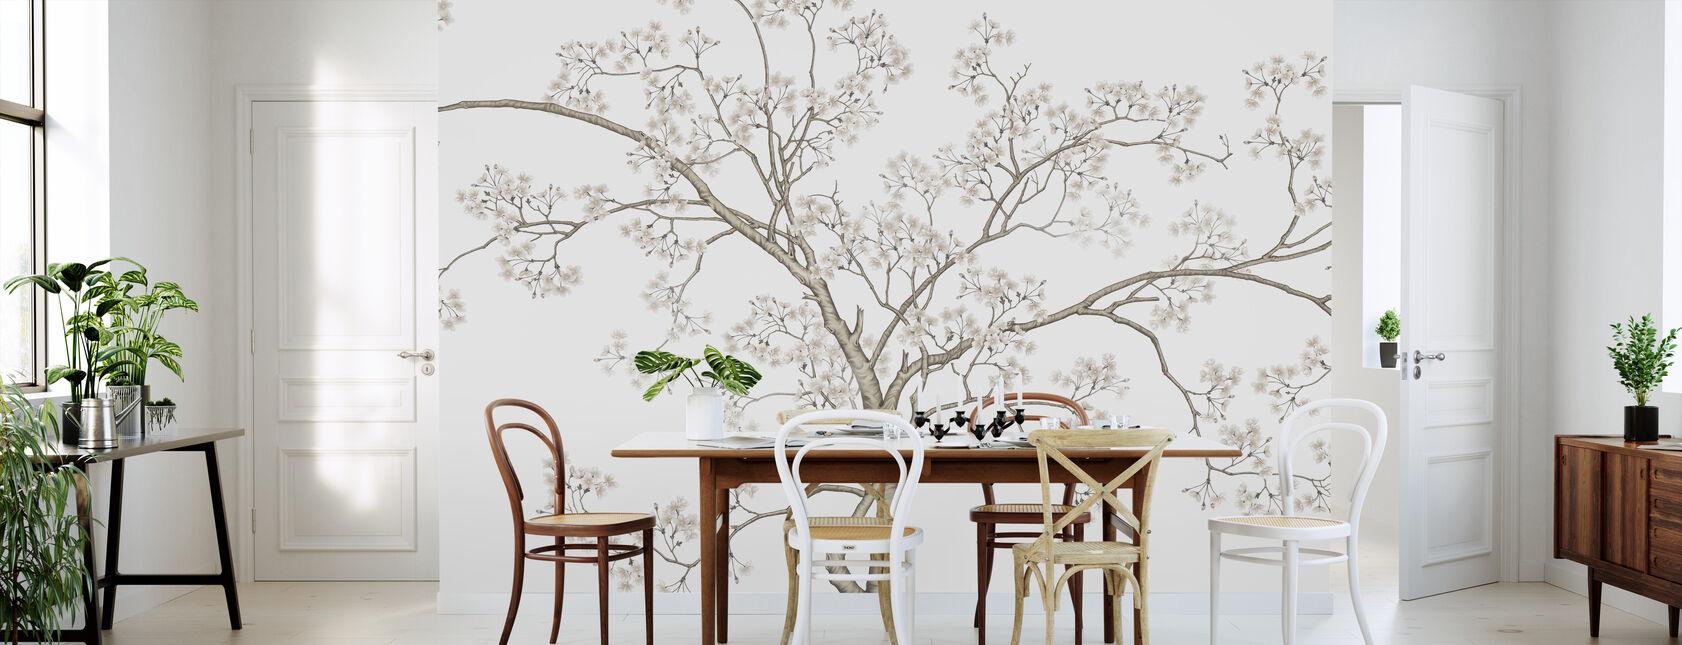 The Tree - Wallpaper - Kitchen